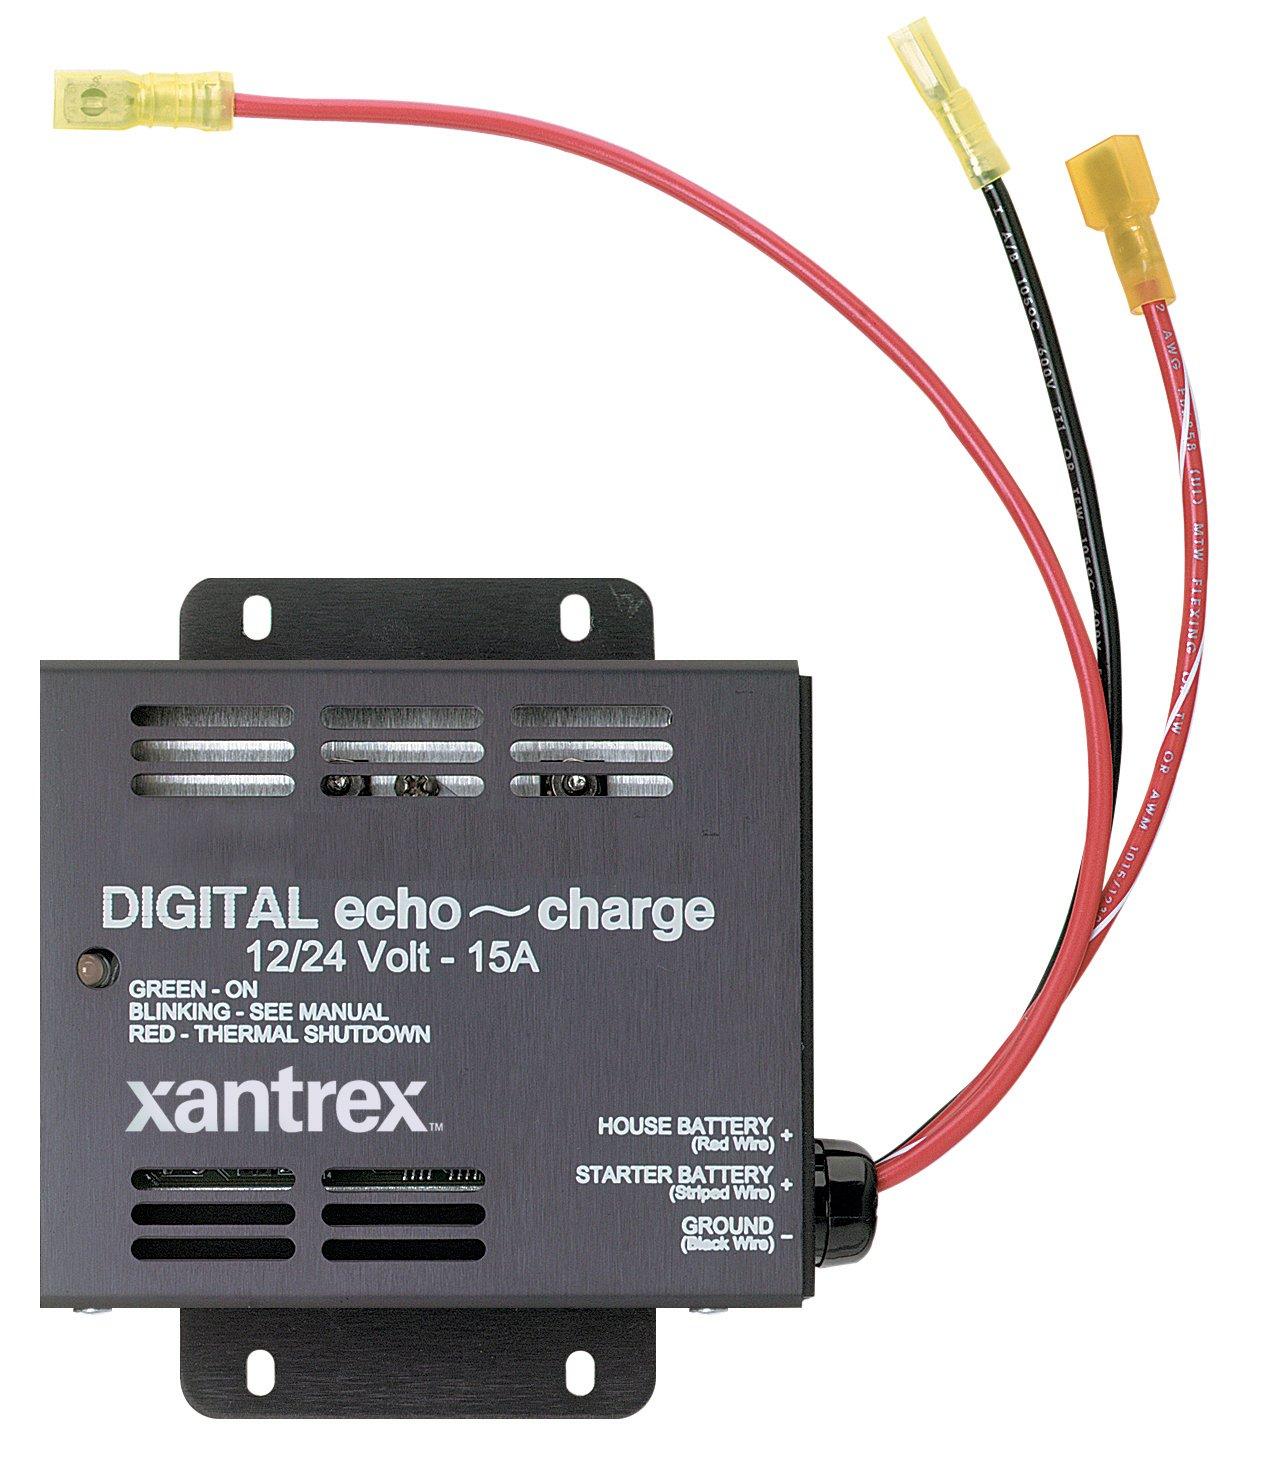 Xantrex Technology Inc, S-1591C 82-0123-01 Digital Echo-Charge 15A by Xantrex Technology Inc,